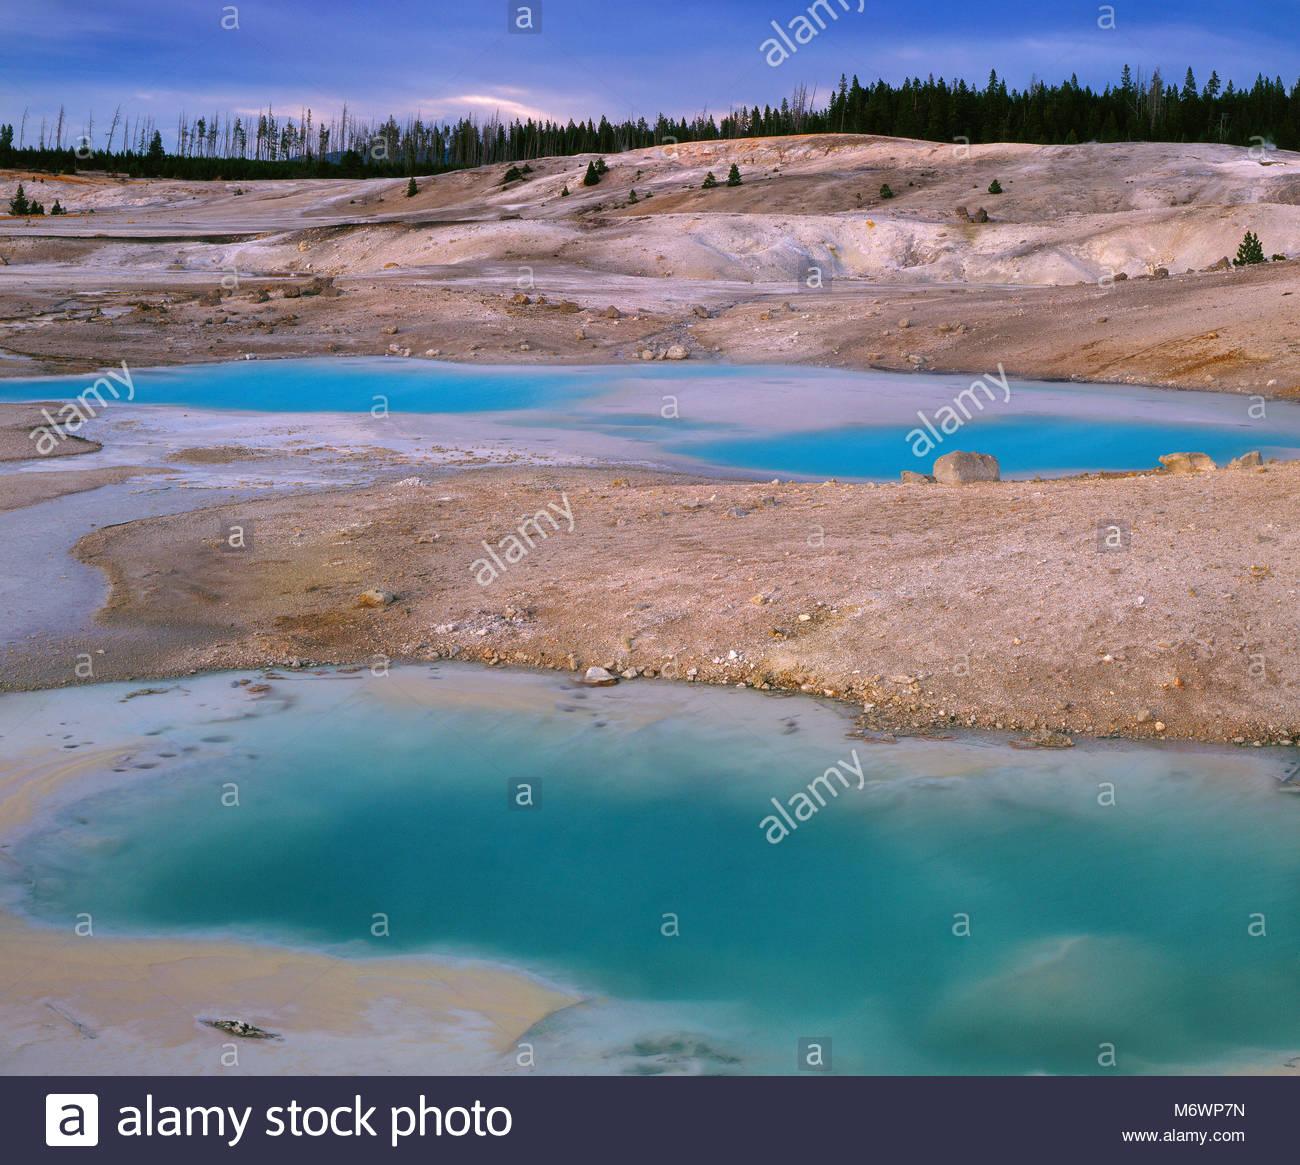 Norris Géiser Cuenca, Parque Nacional Yellowstone, Wyoming Foto de stock